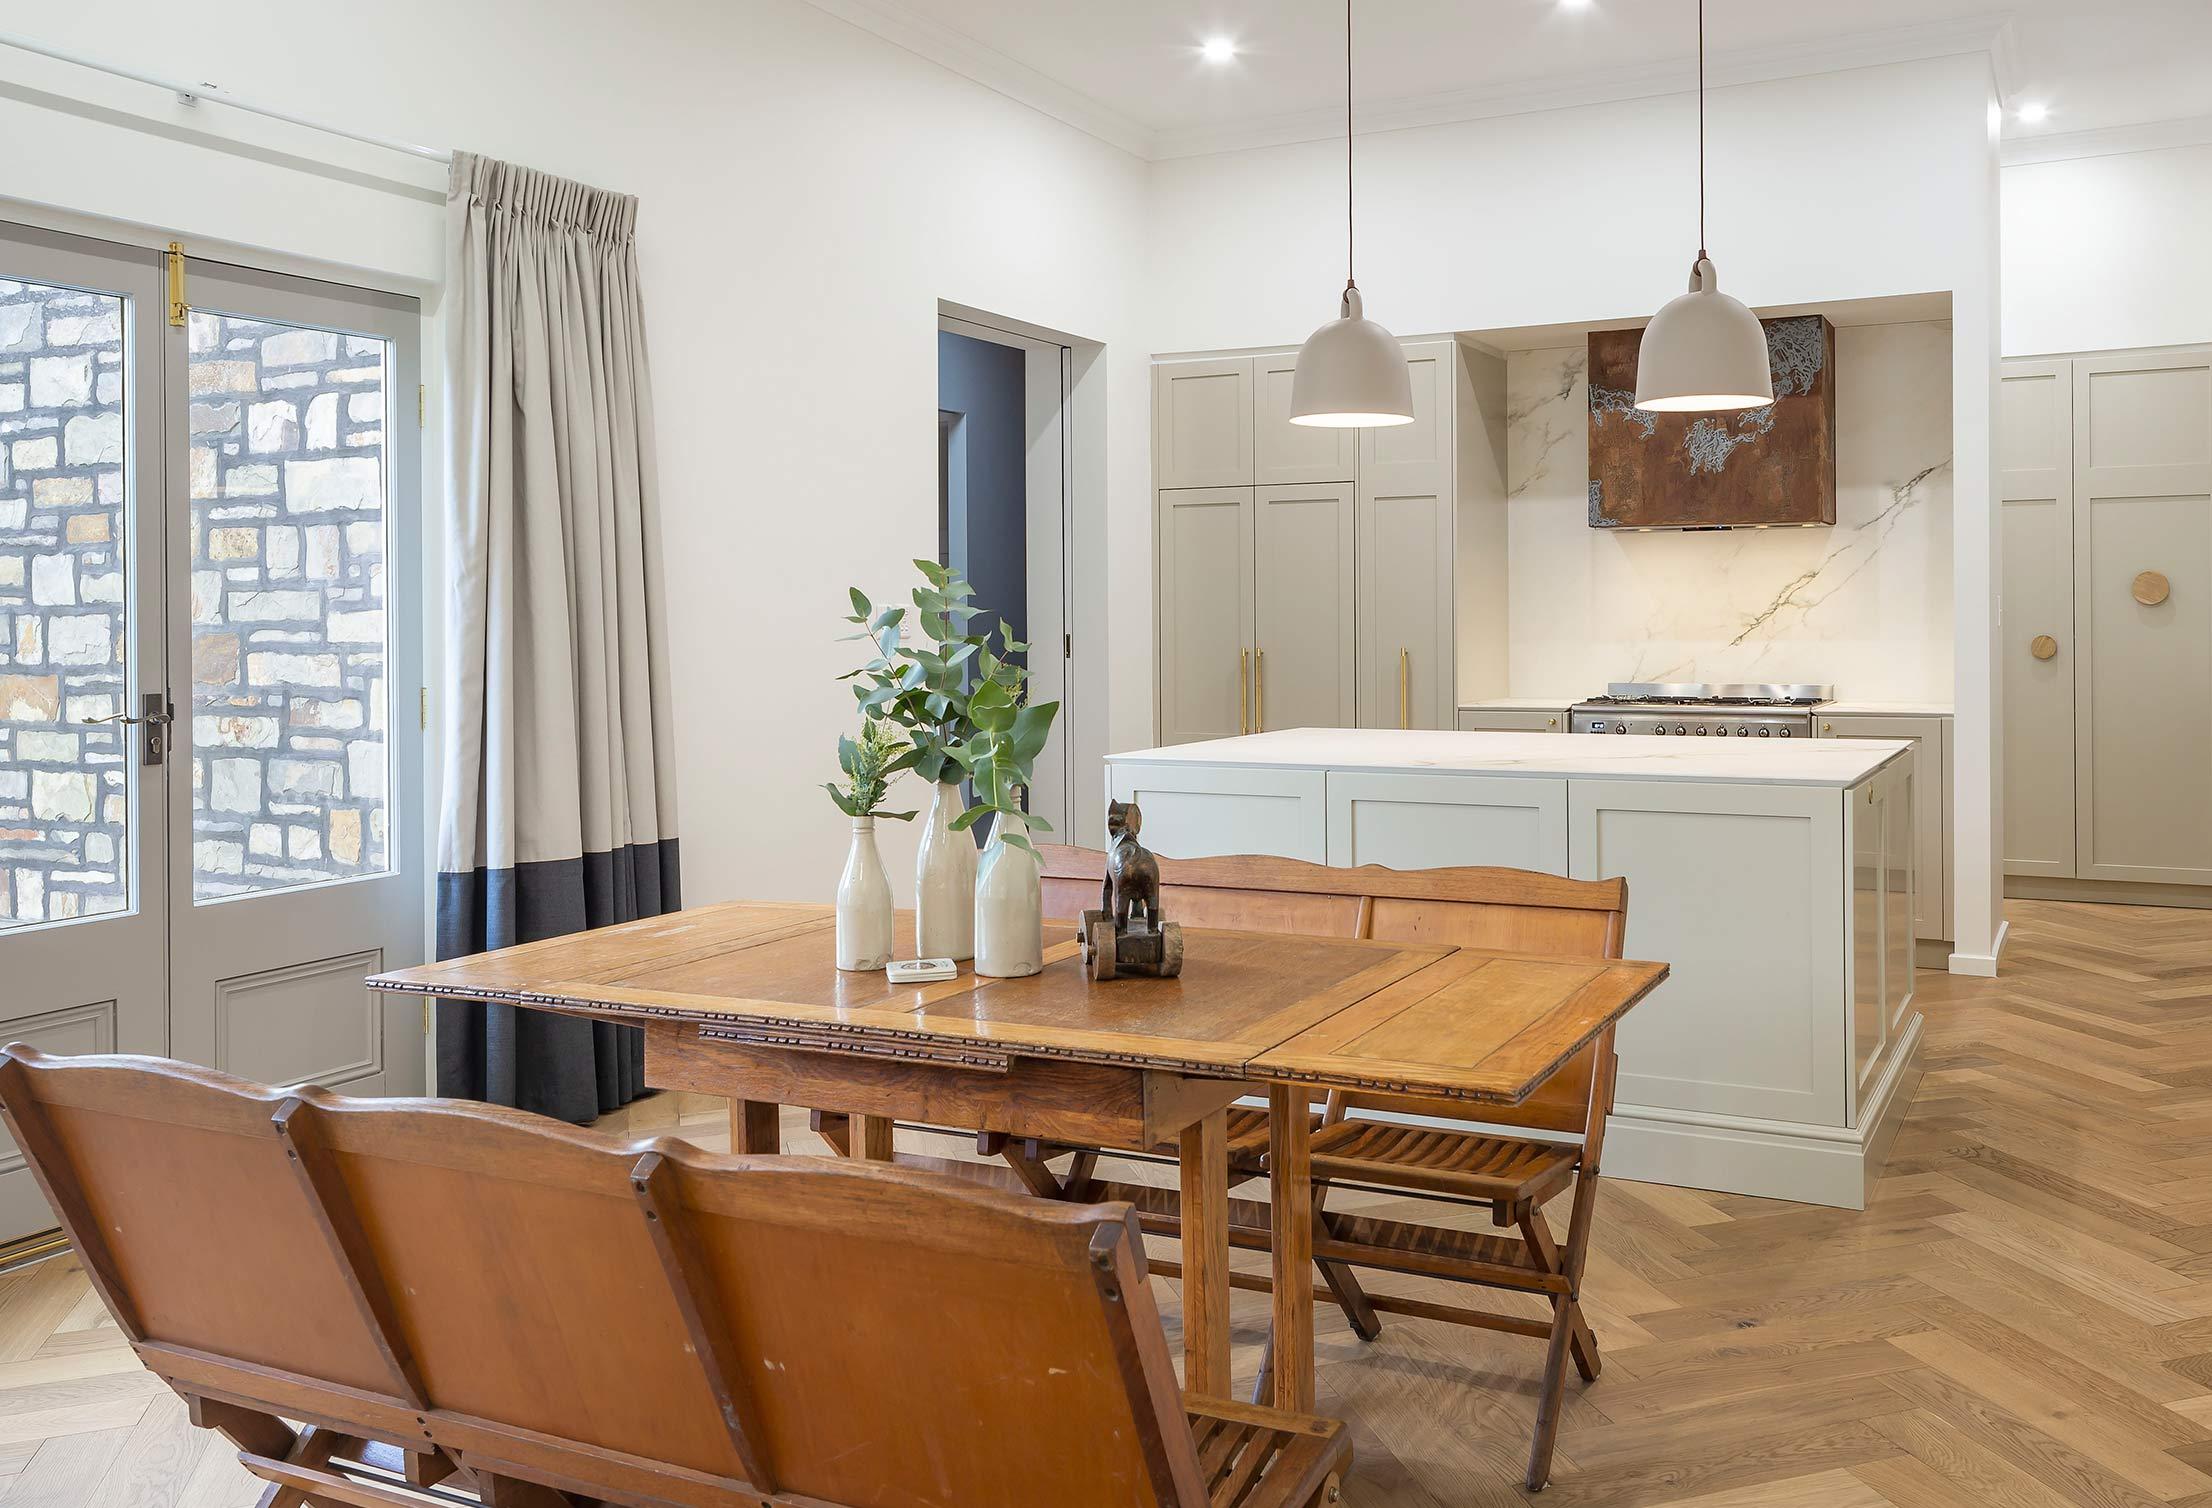 turnbull-built-renovation-living-goodwood-sa.jpg